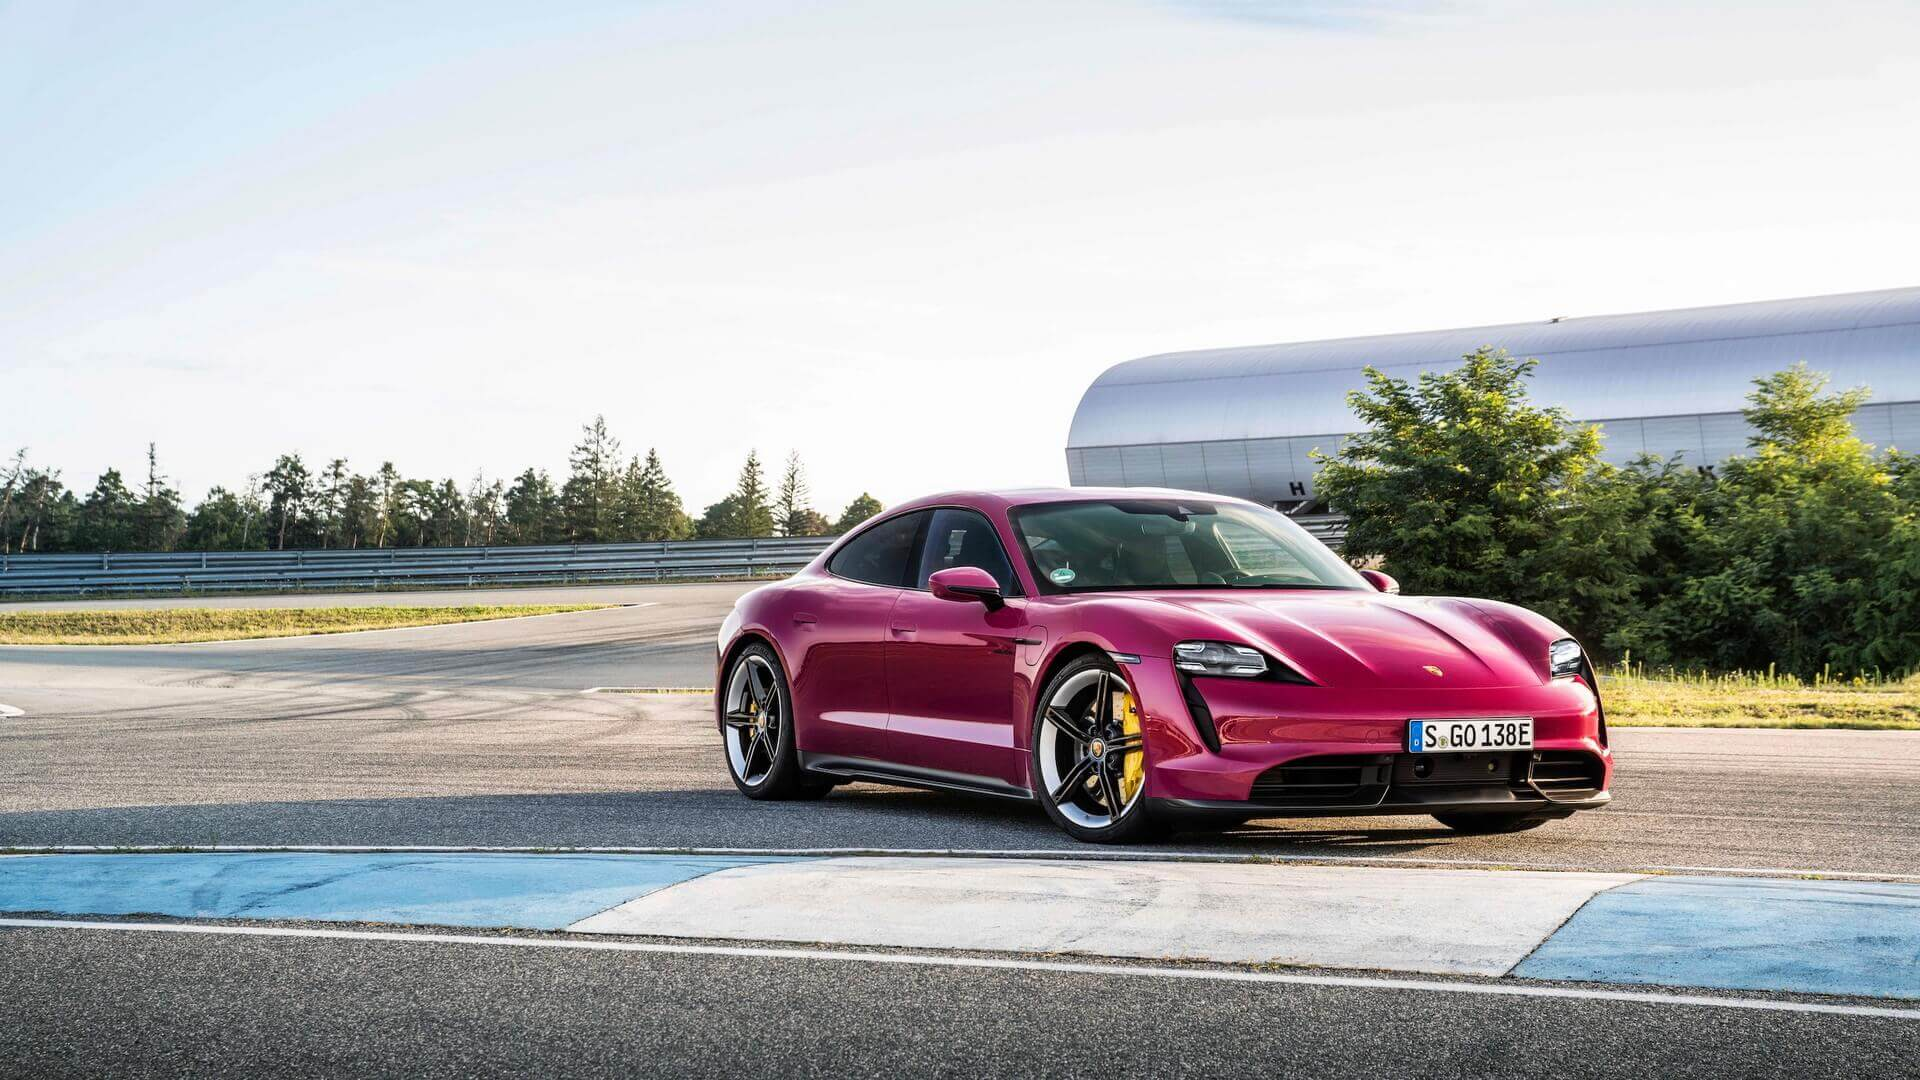 Porsche Taycan и Taycan Cross Turismo 2022 модельного года получилиподдержку Android Auto